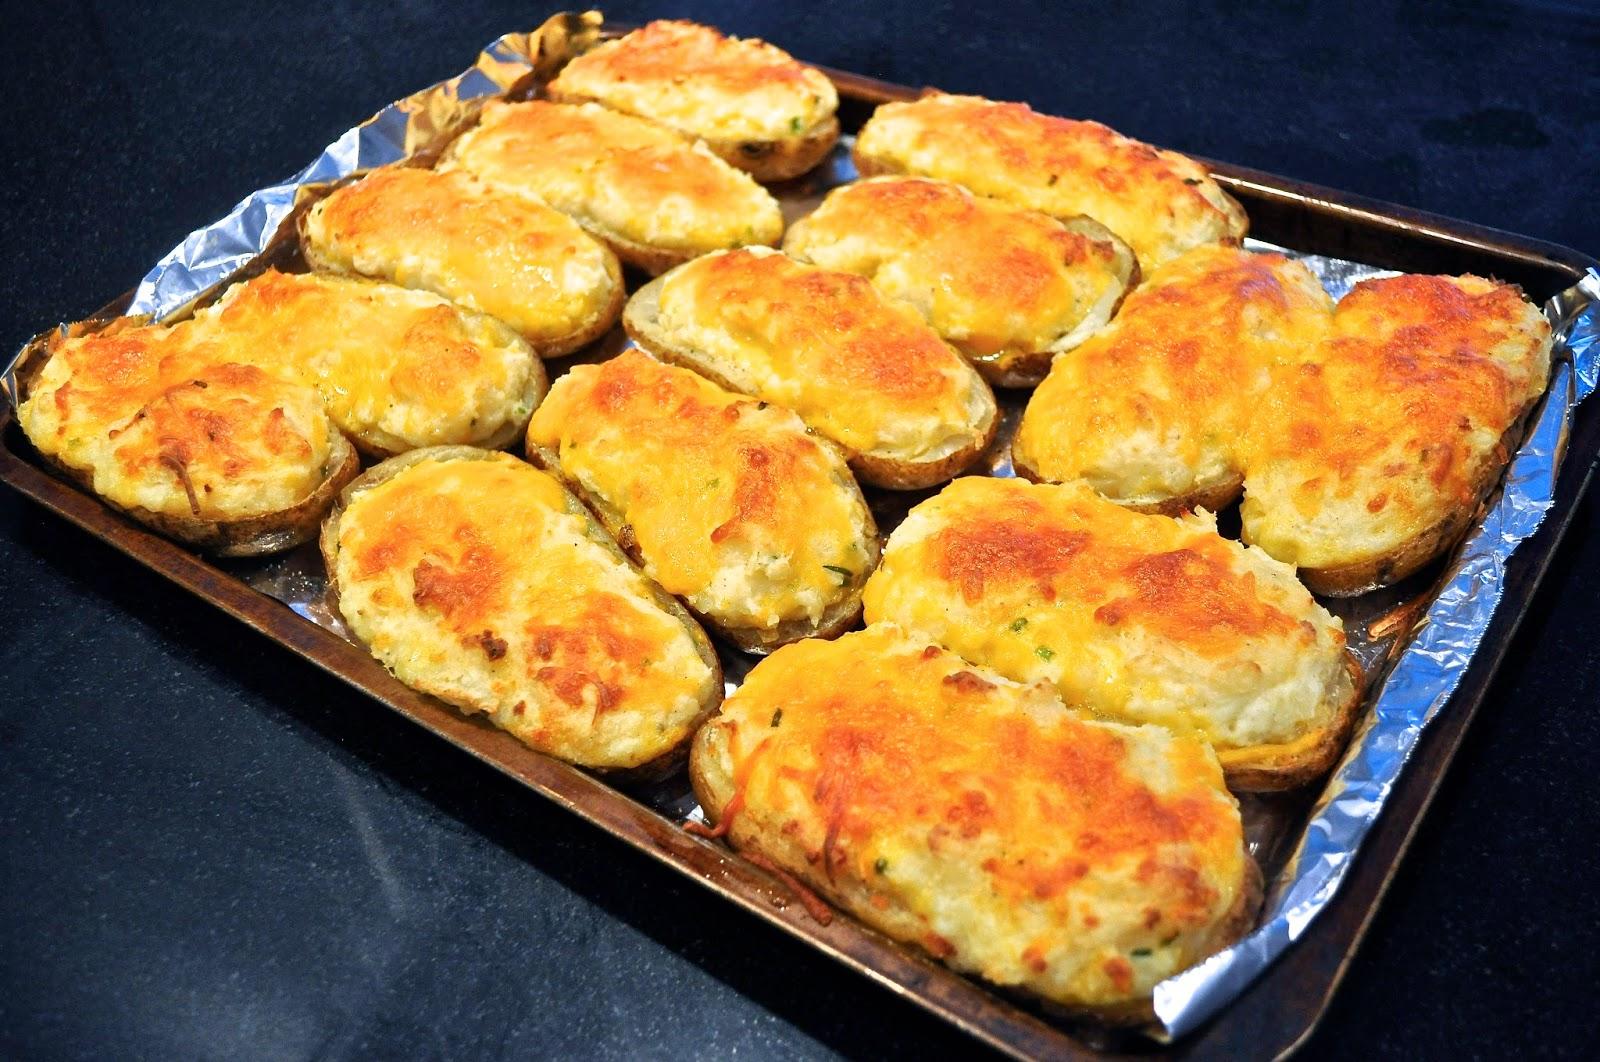 Ciao Chow Linda: Stuffed Baked Potatoes